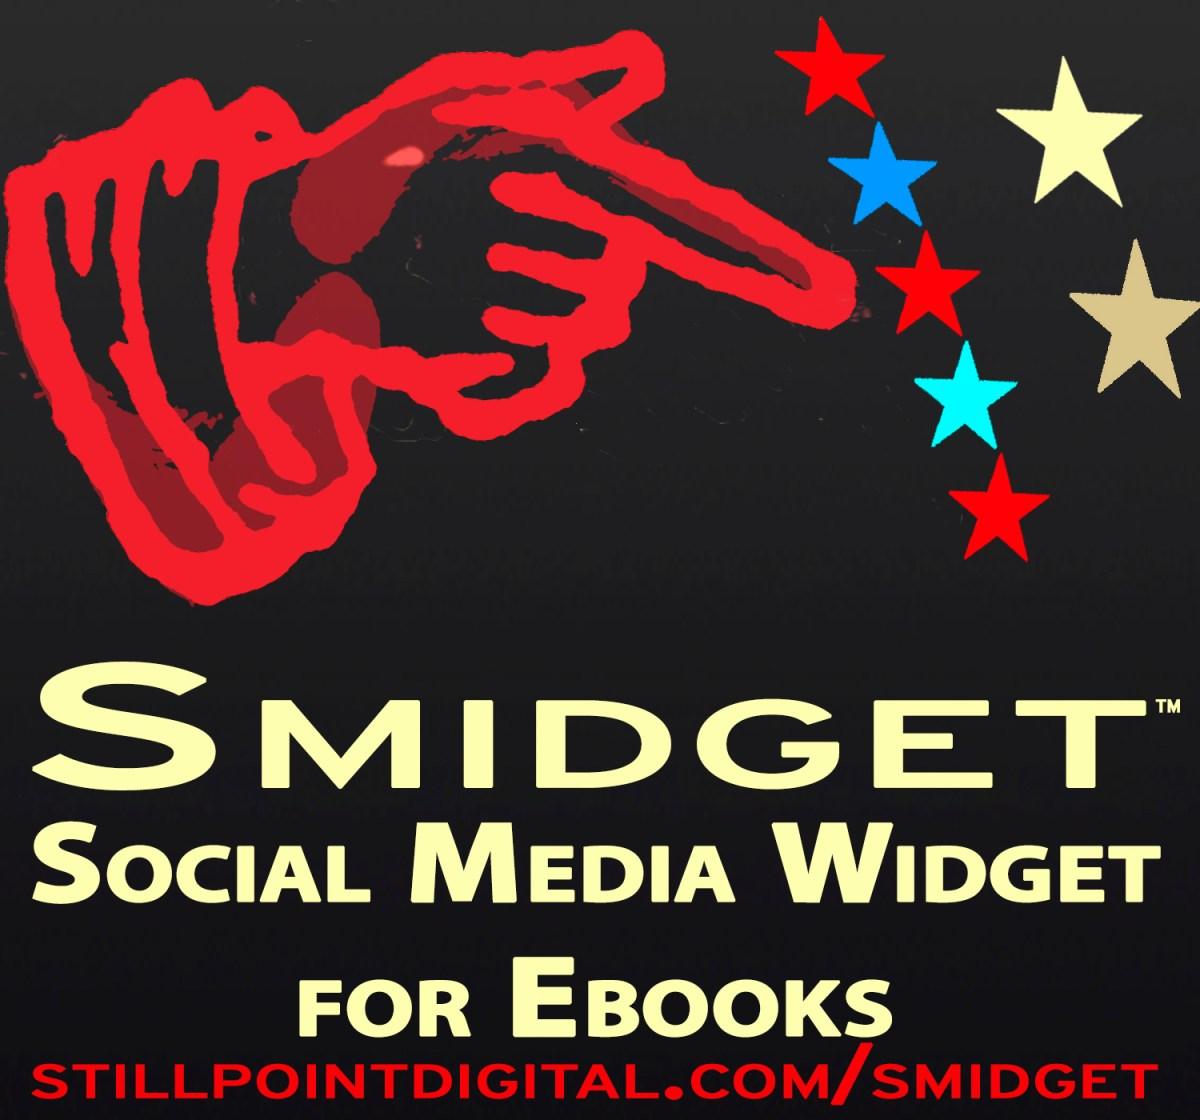 Smidget — the social media widget for ebooks